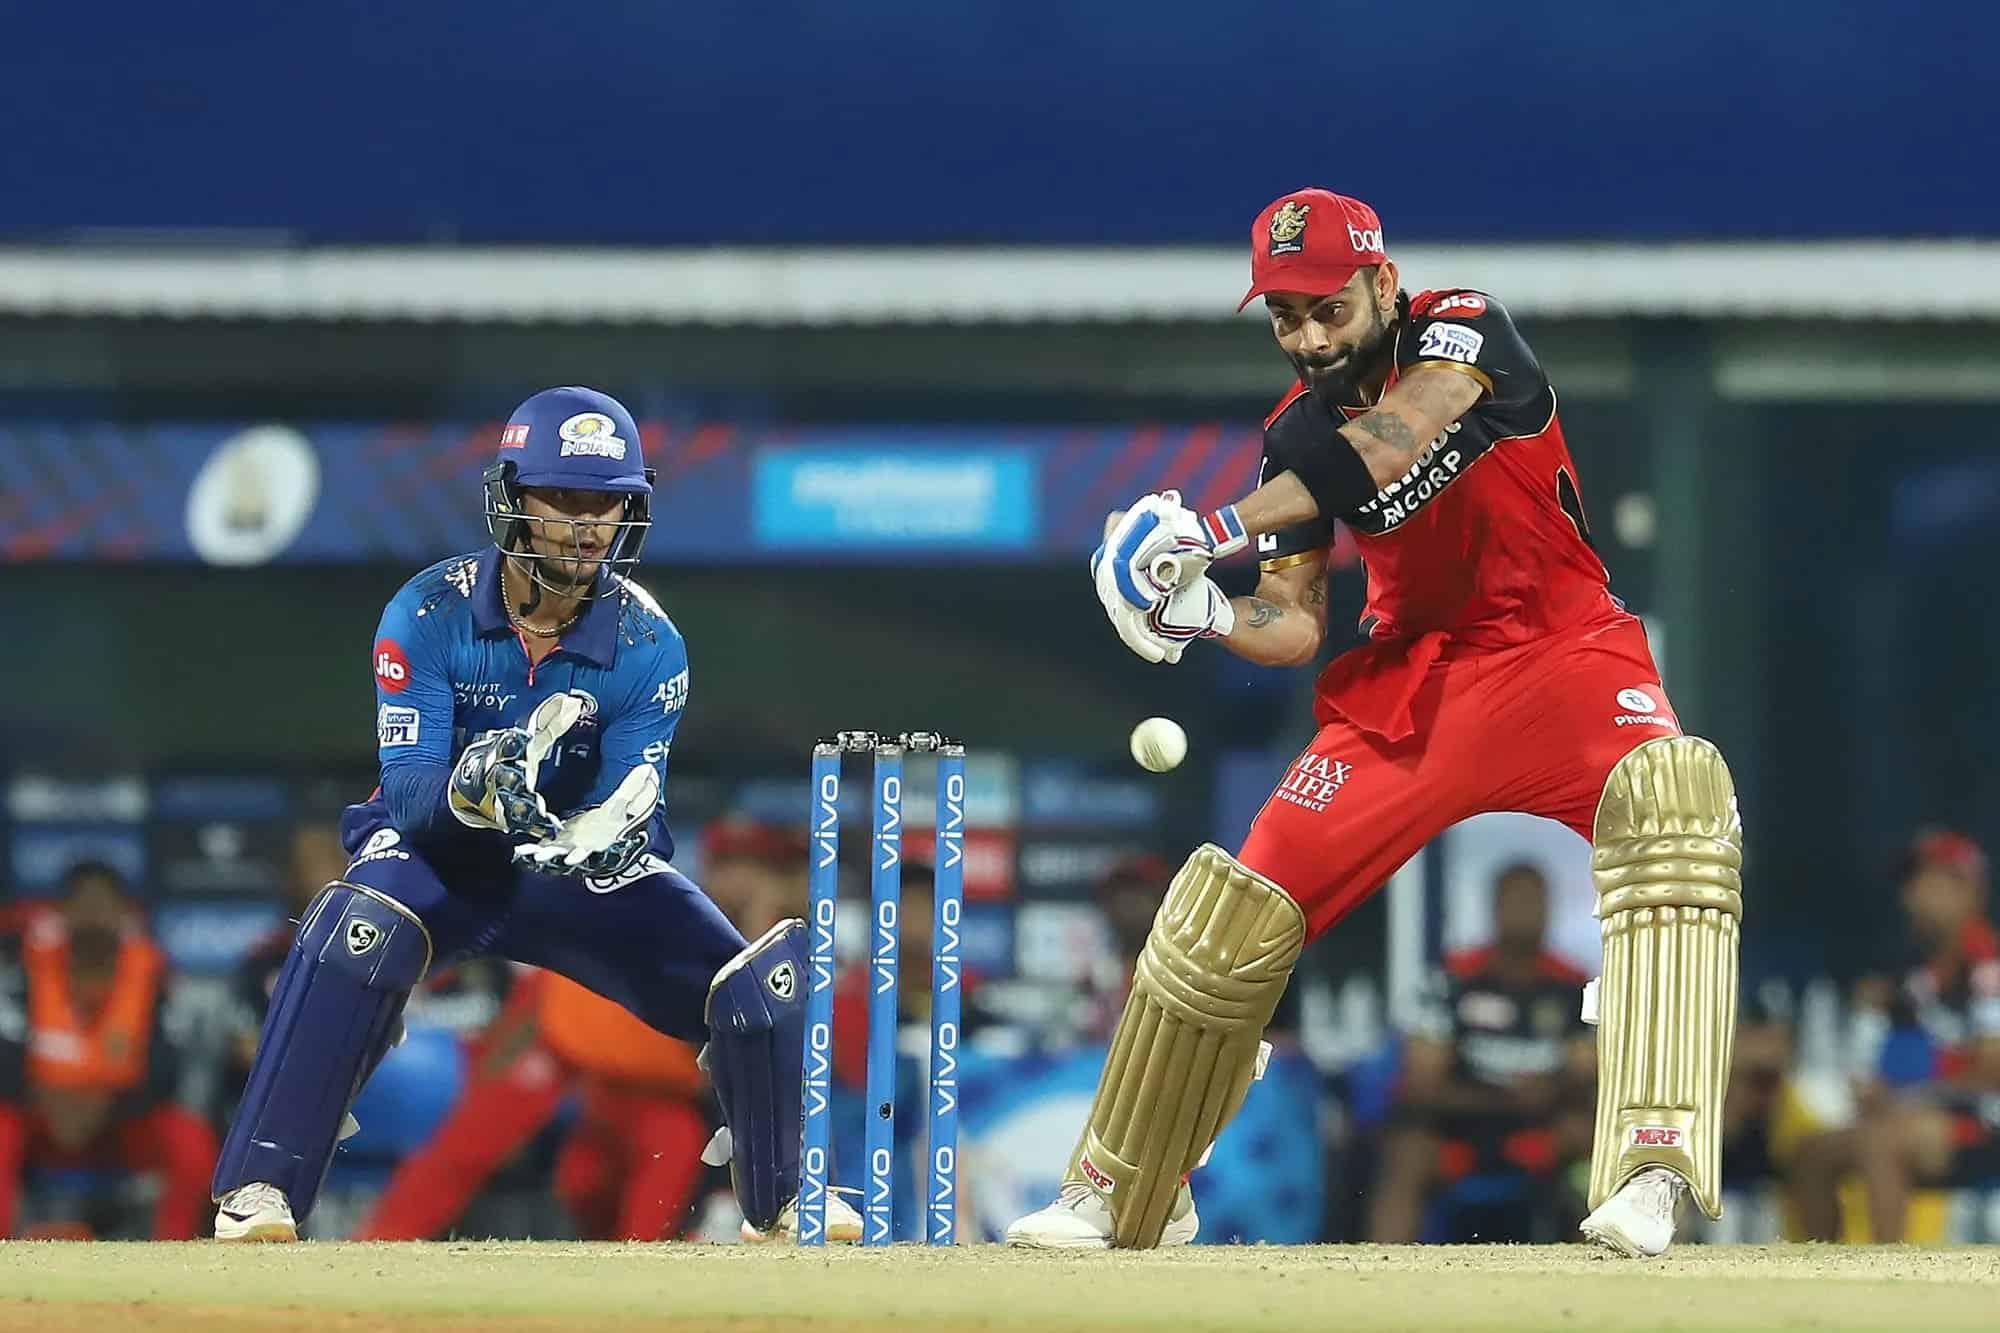 Virat Kohli Completes 6,000 Runs in IPL As Captain